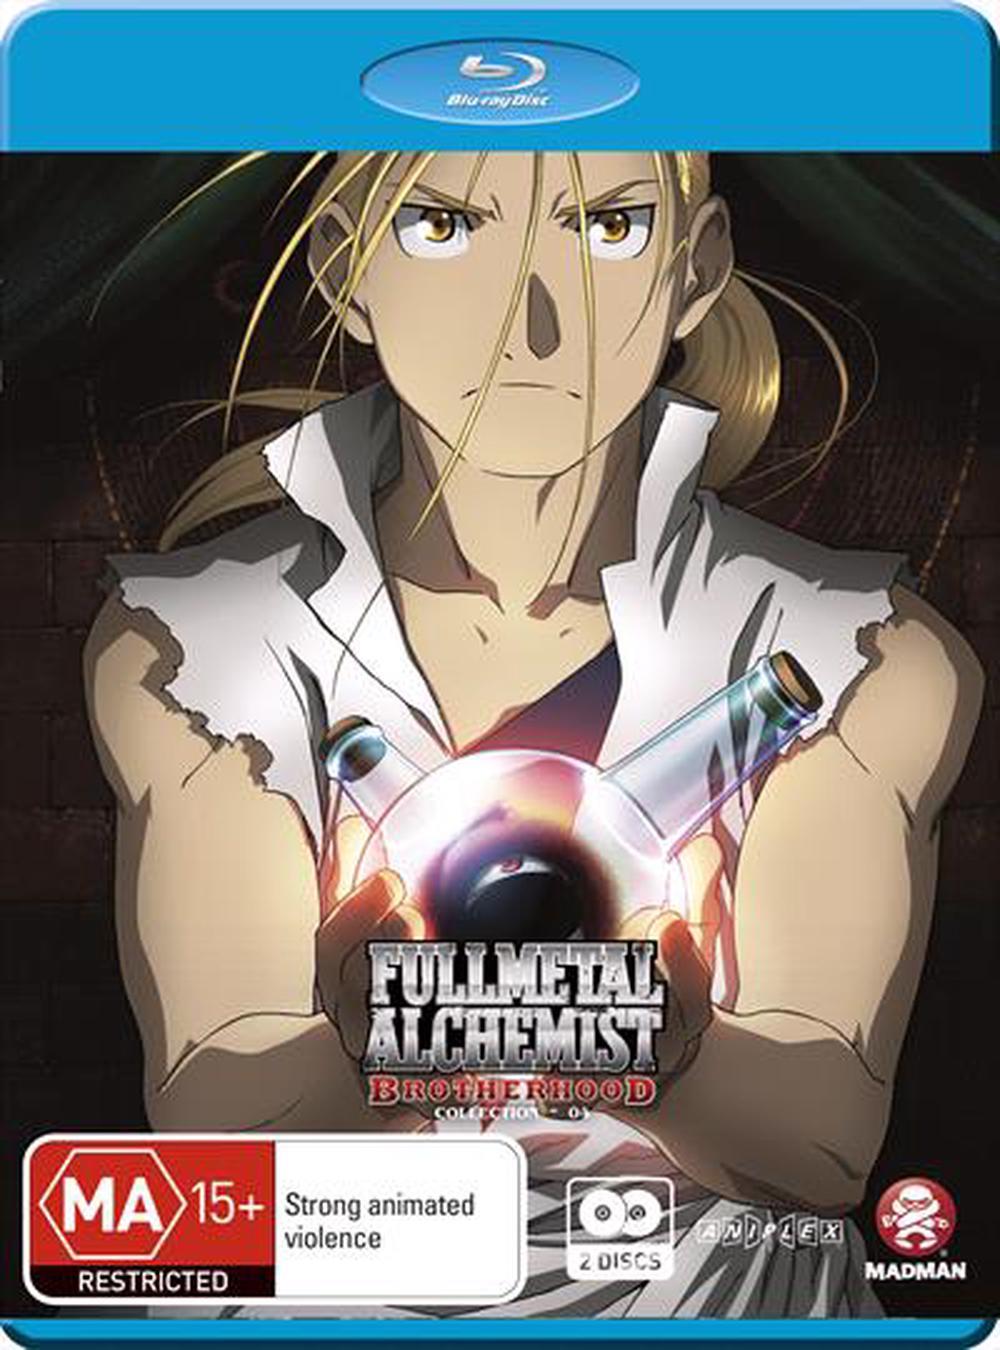 Fullmetal Alchemist: Brotherhood Collection 4 (Ep 40-52)